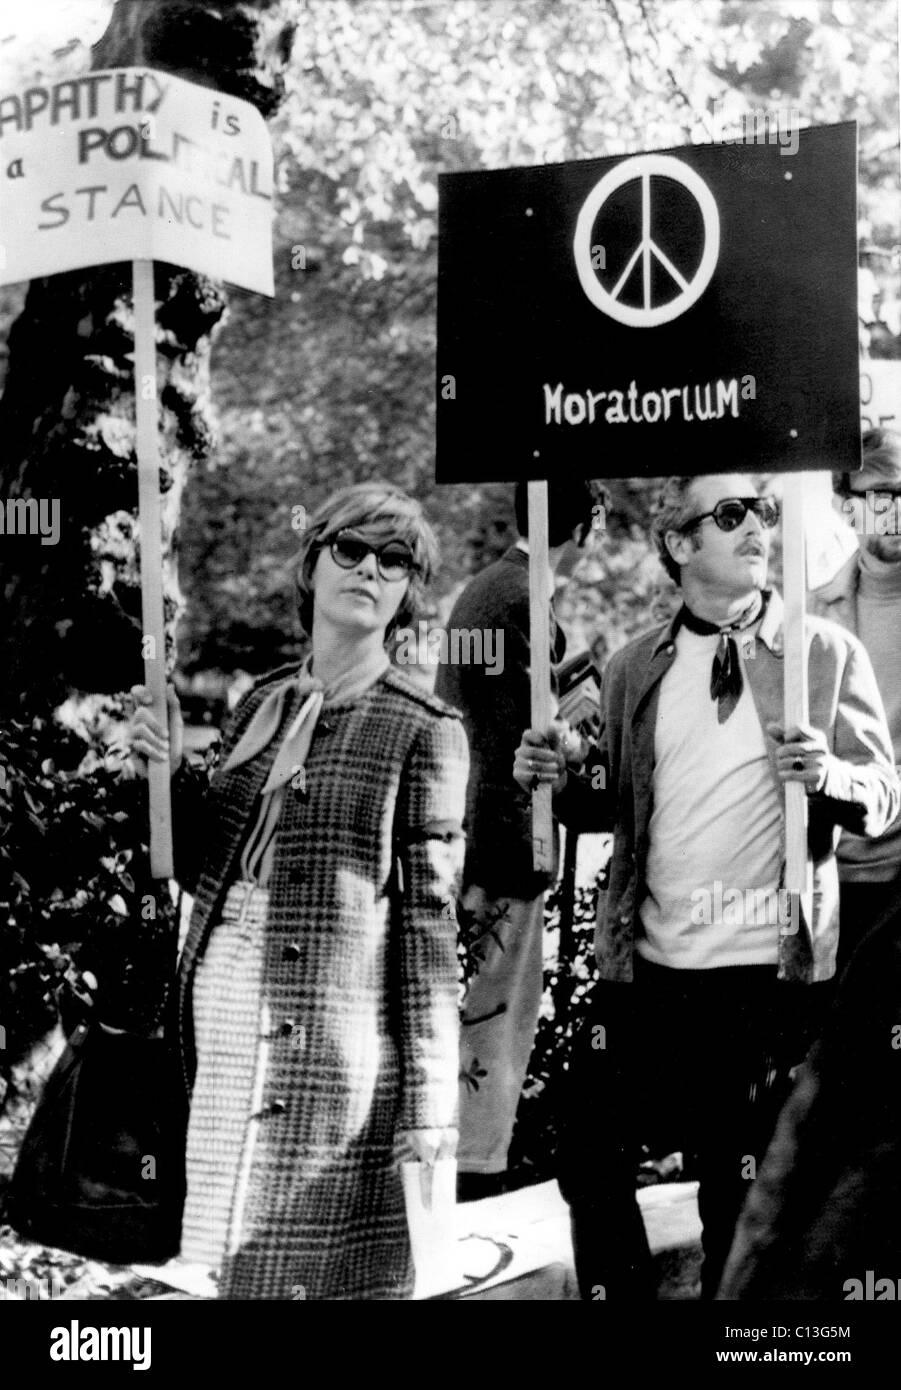 JOANNE WOODWARD und PAUL NEWMAN protestieren den Vietnam-Krieg, 1969 Stockbild